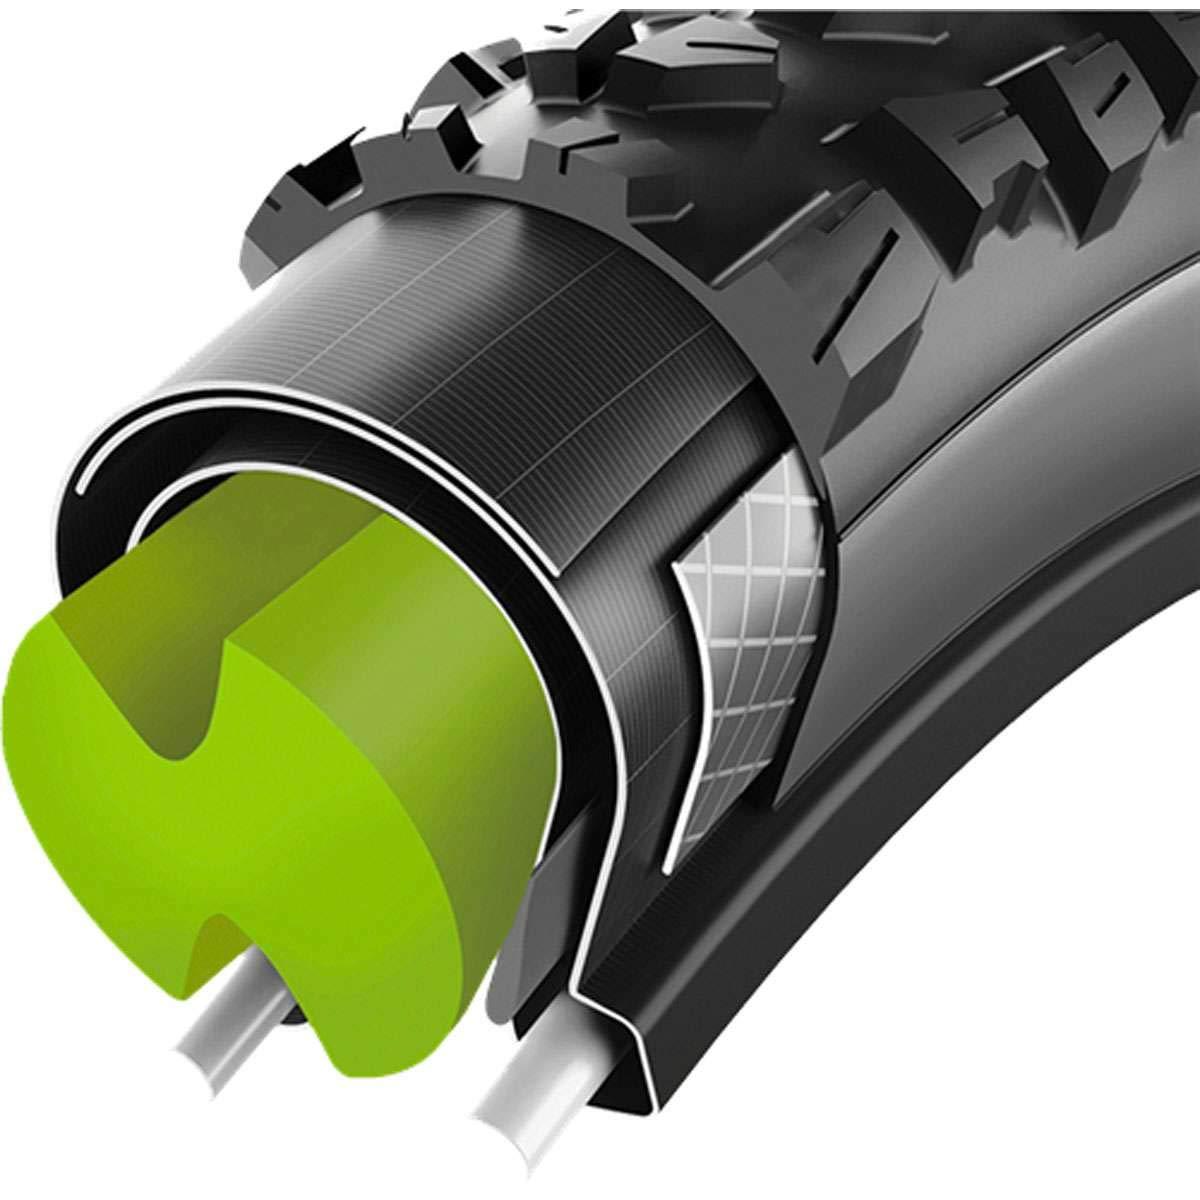 Vittoria Air-Liner Tire Insert Green, Medium, 2.5in by Vittoria